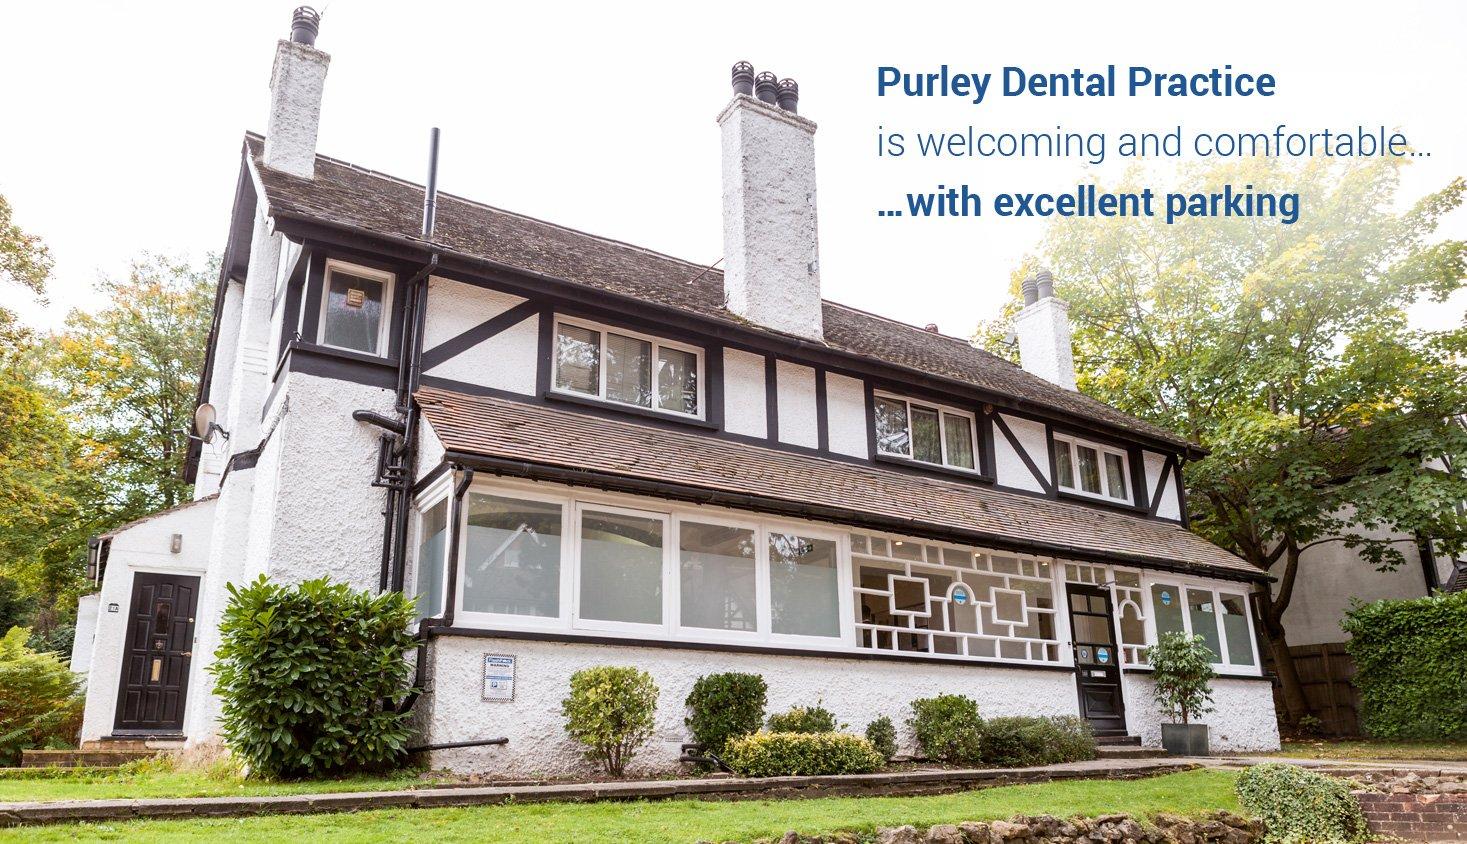 purley dental practice